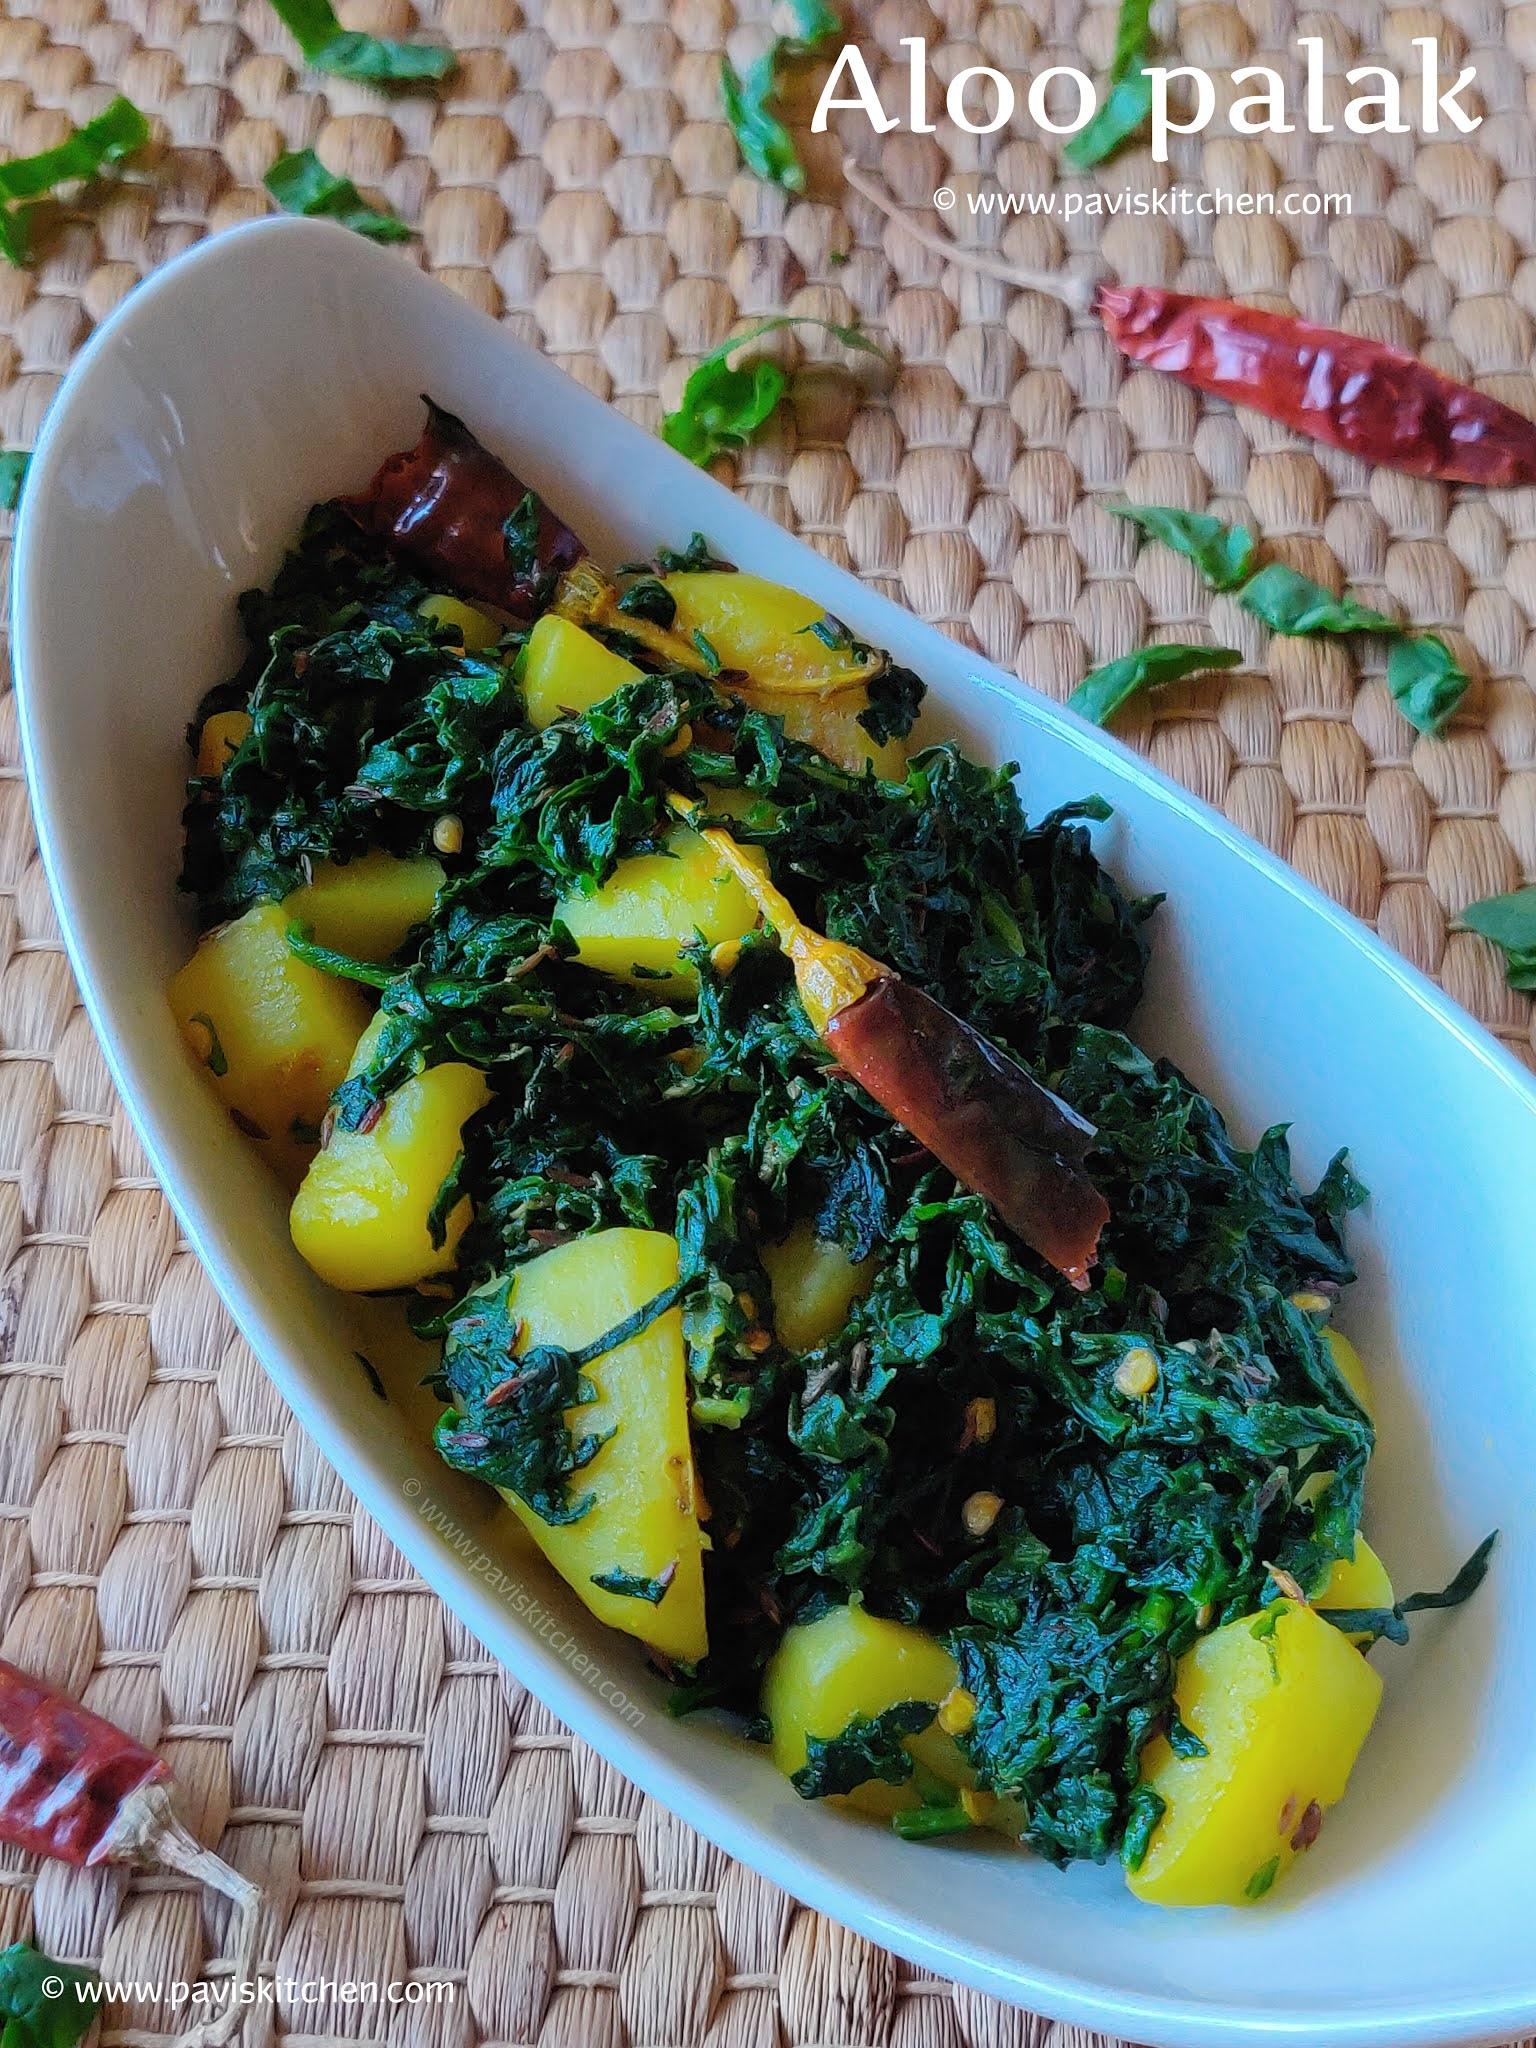 Aloo palak dry recipe | Punjabi saag aloo recipe | Potato spinach curry | Indian recipe